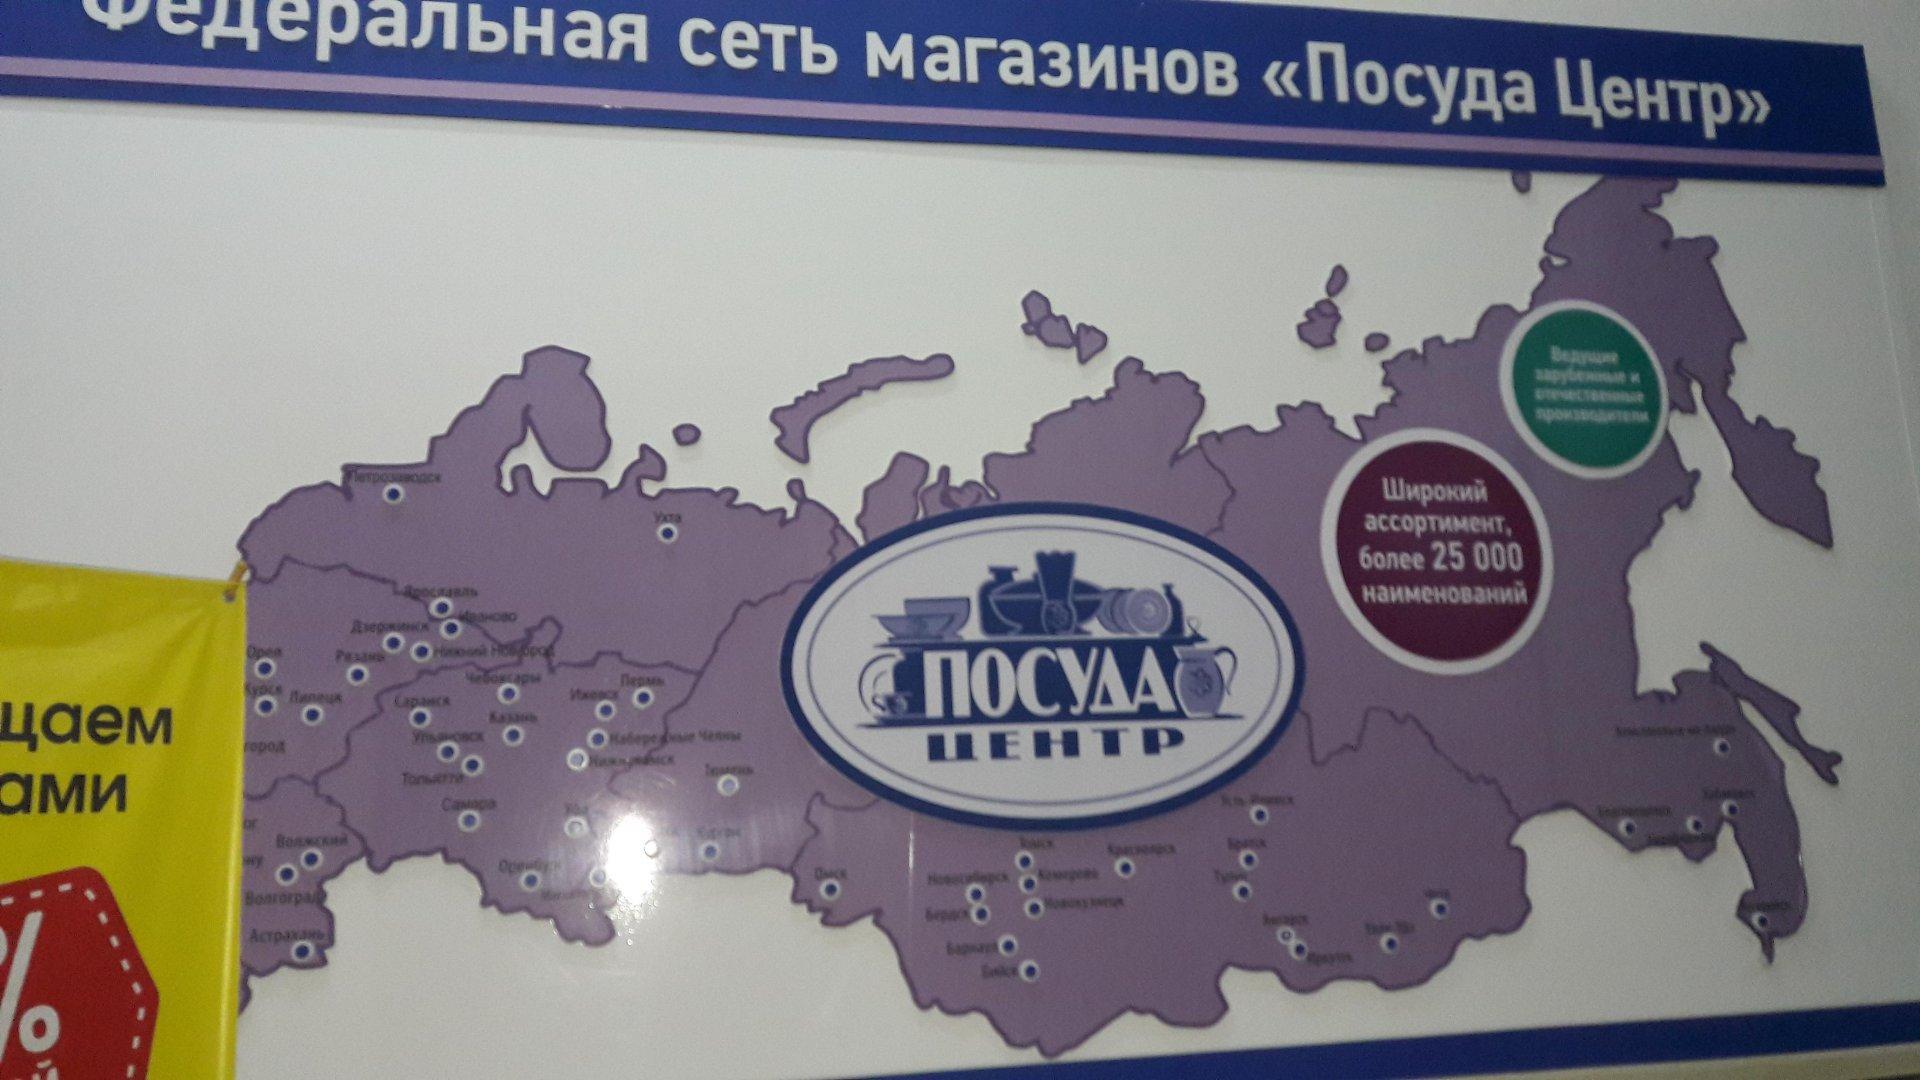 Ярославль Куда Переехал Магазин Посуда Центр